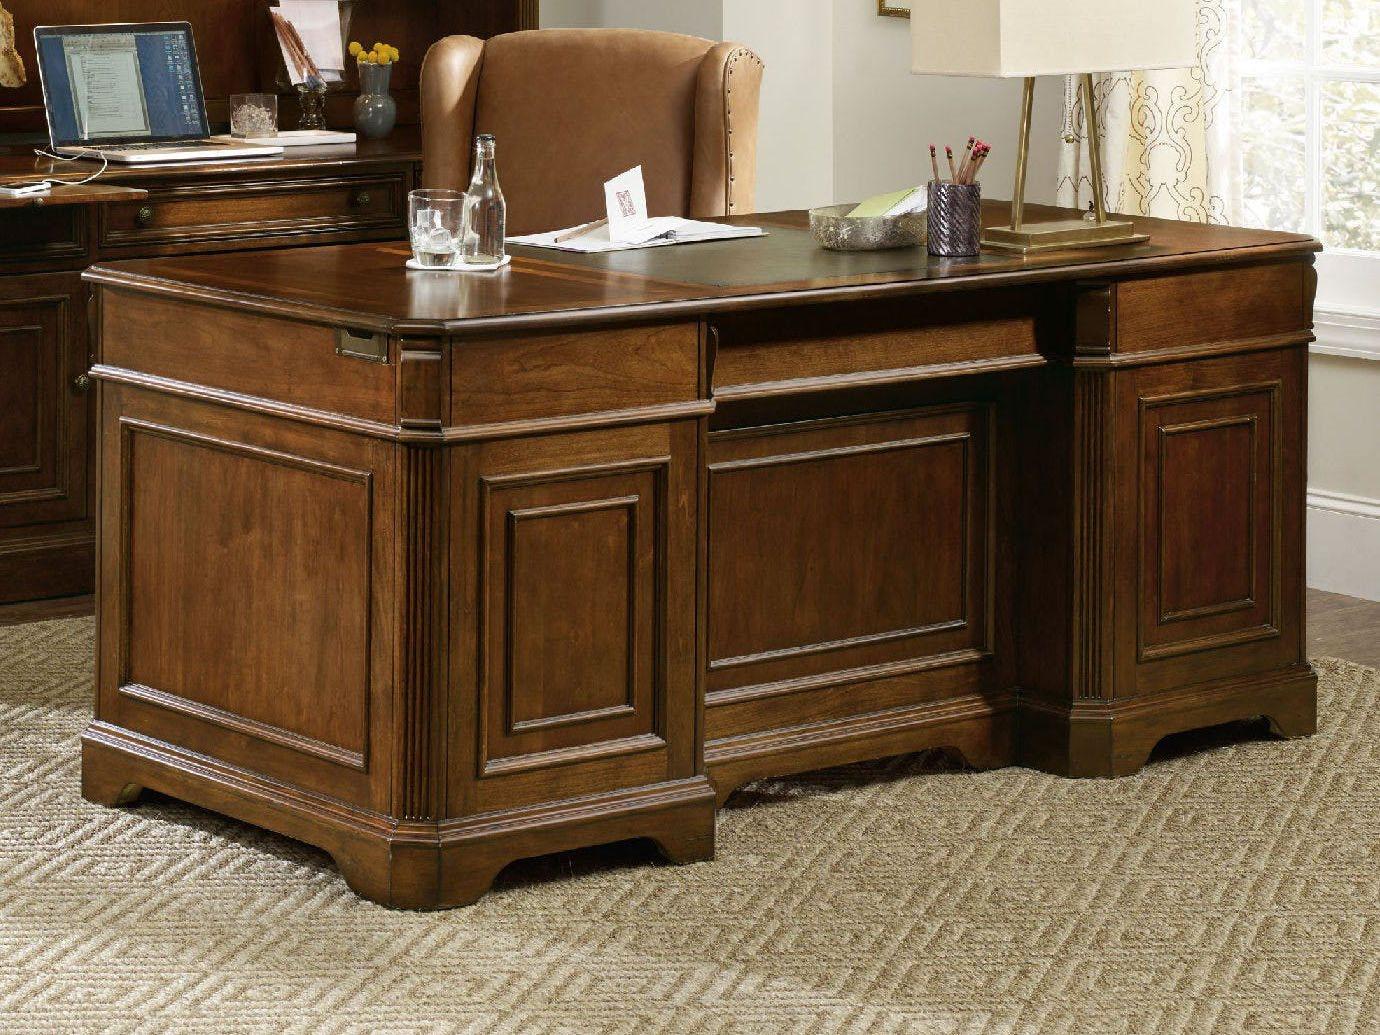 Hooker Furniture Brookhaven Distressed Medium Cherry 72 L X 34 W Rectangular Executive Desk